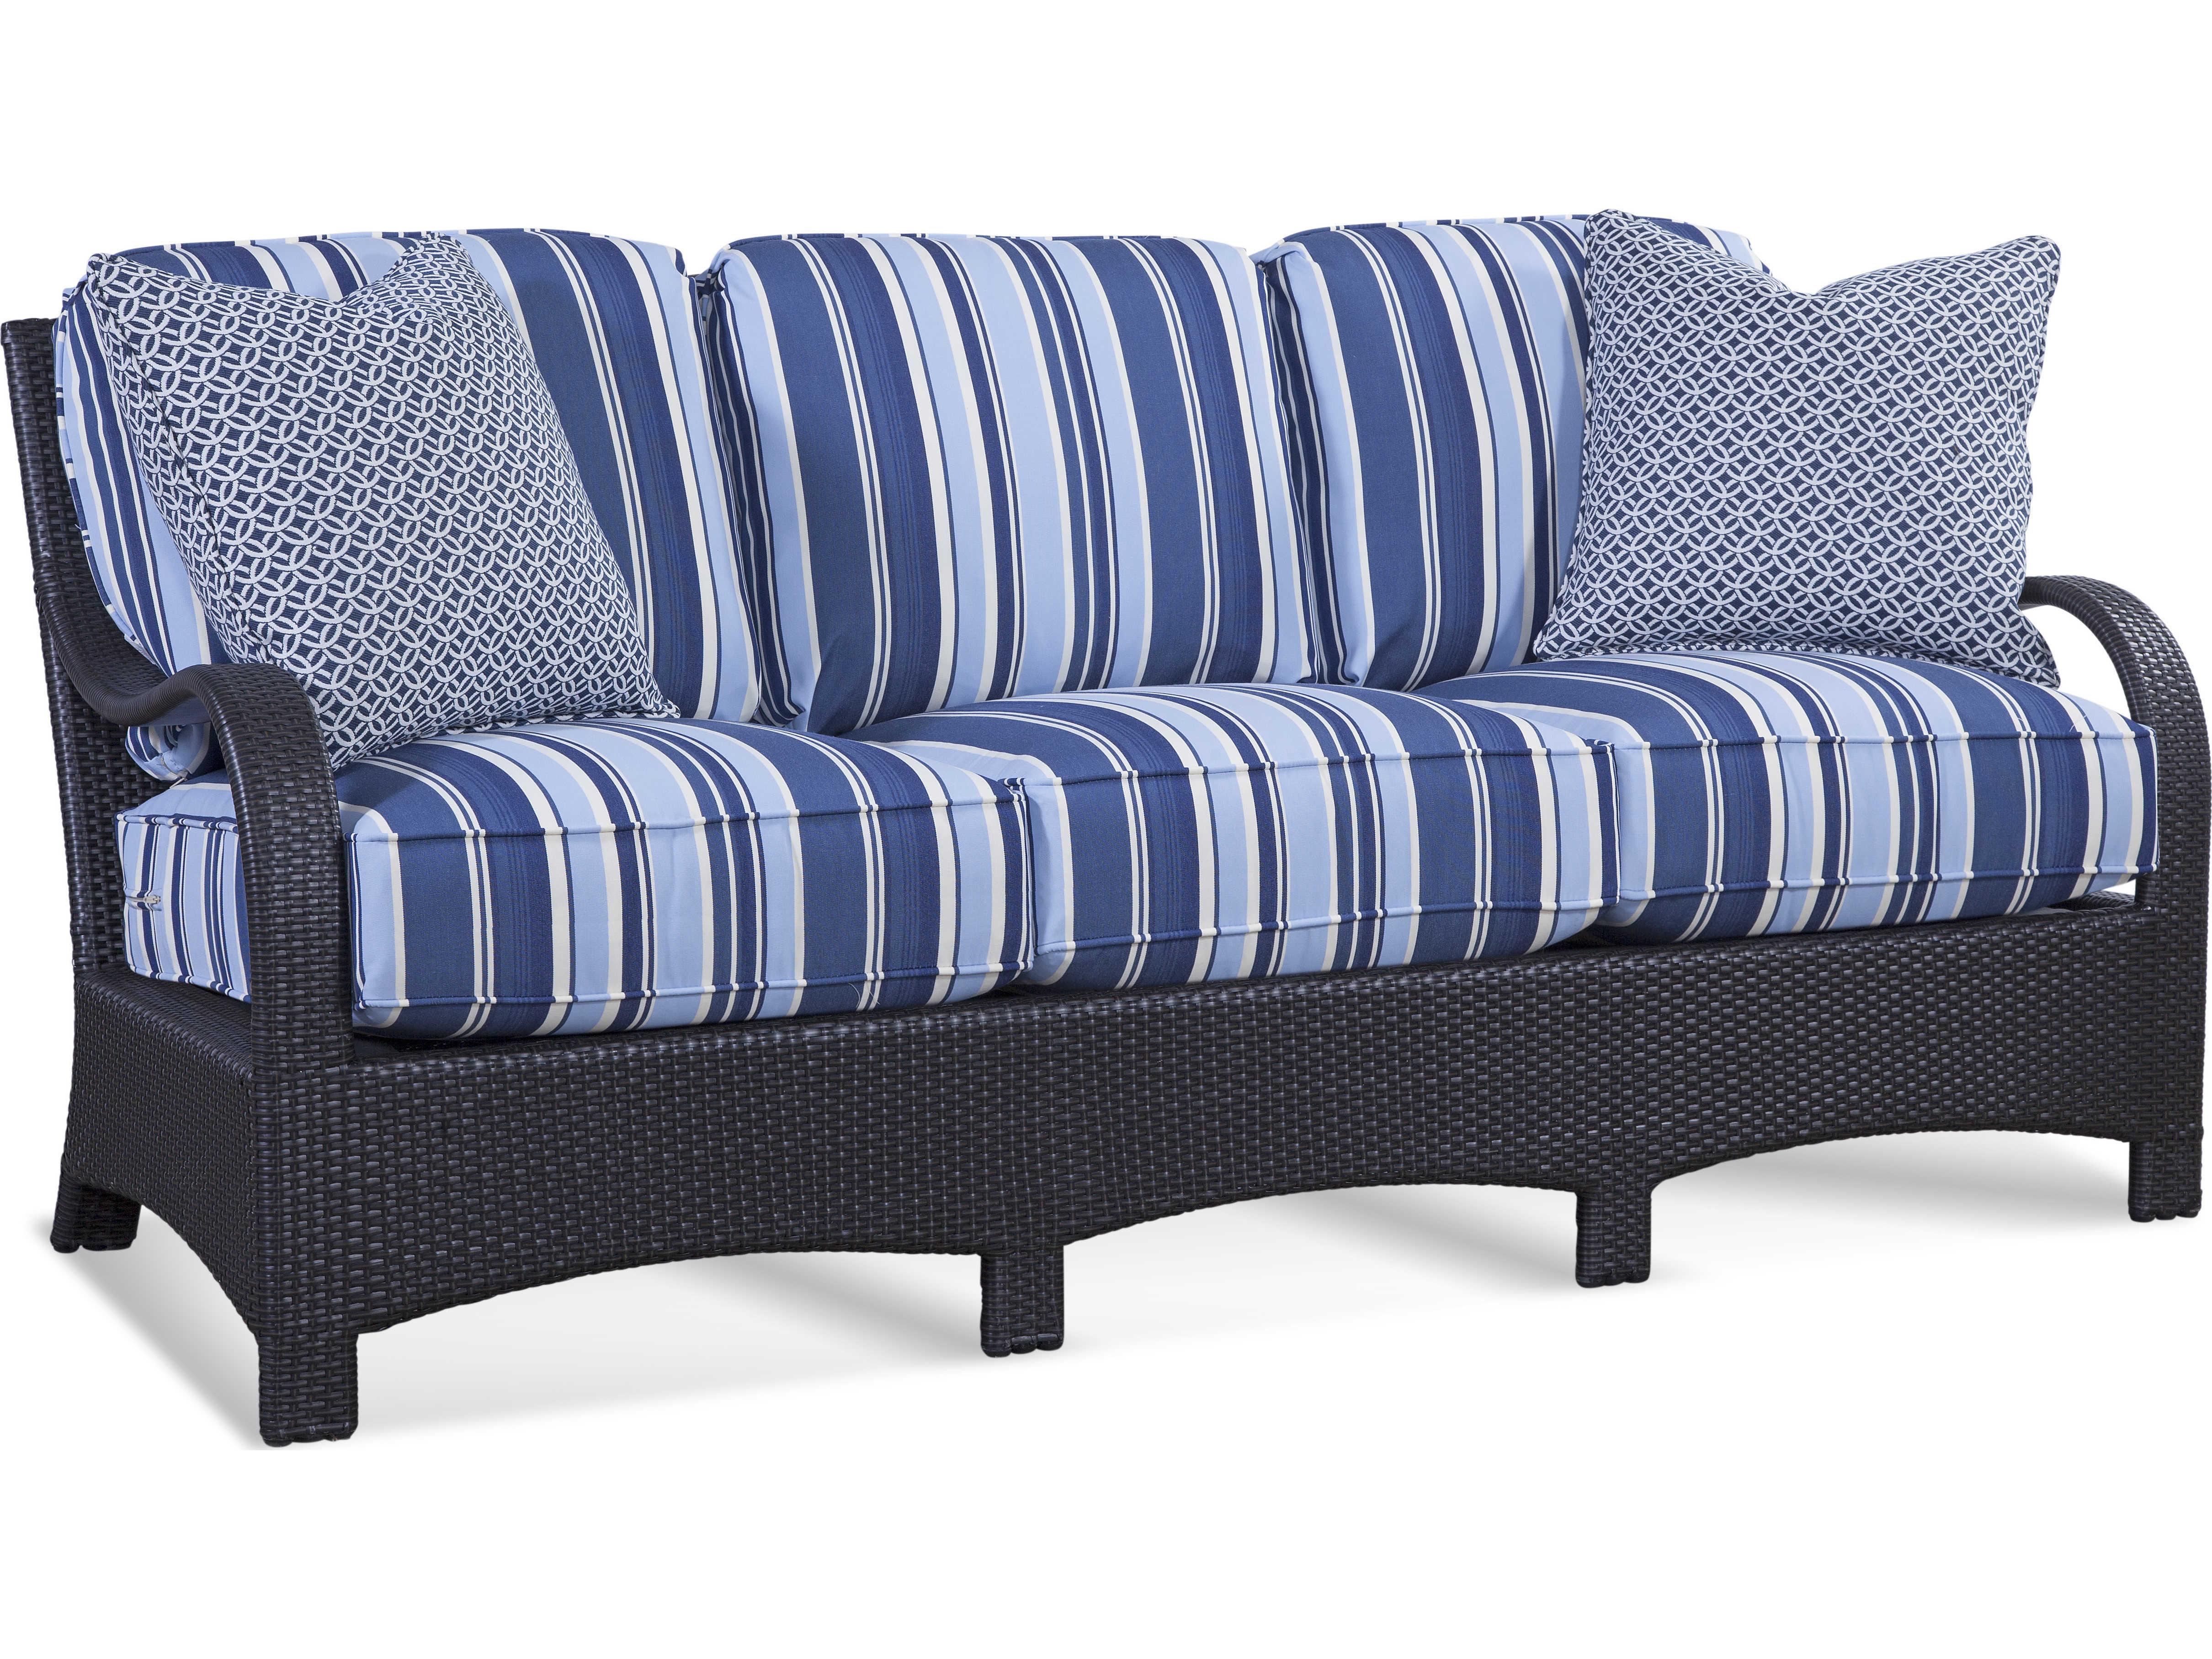 Braxton Culler Outdoor Brighton Pointe Charcoal Wicker Cushion Sofa Bco435011